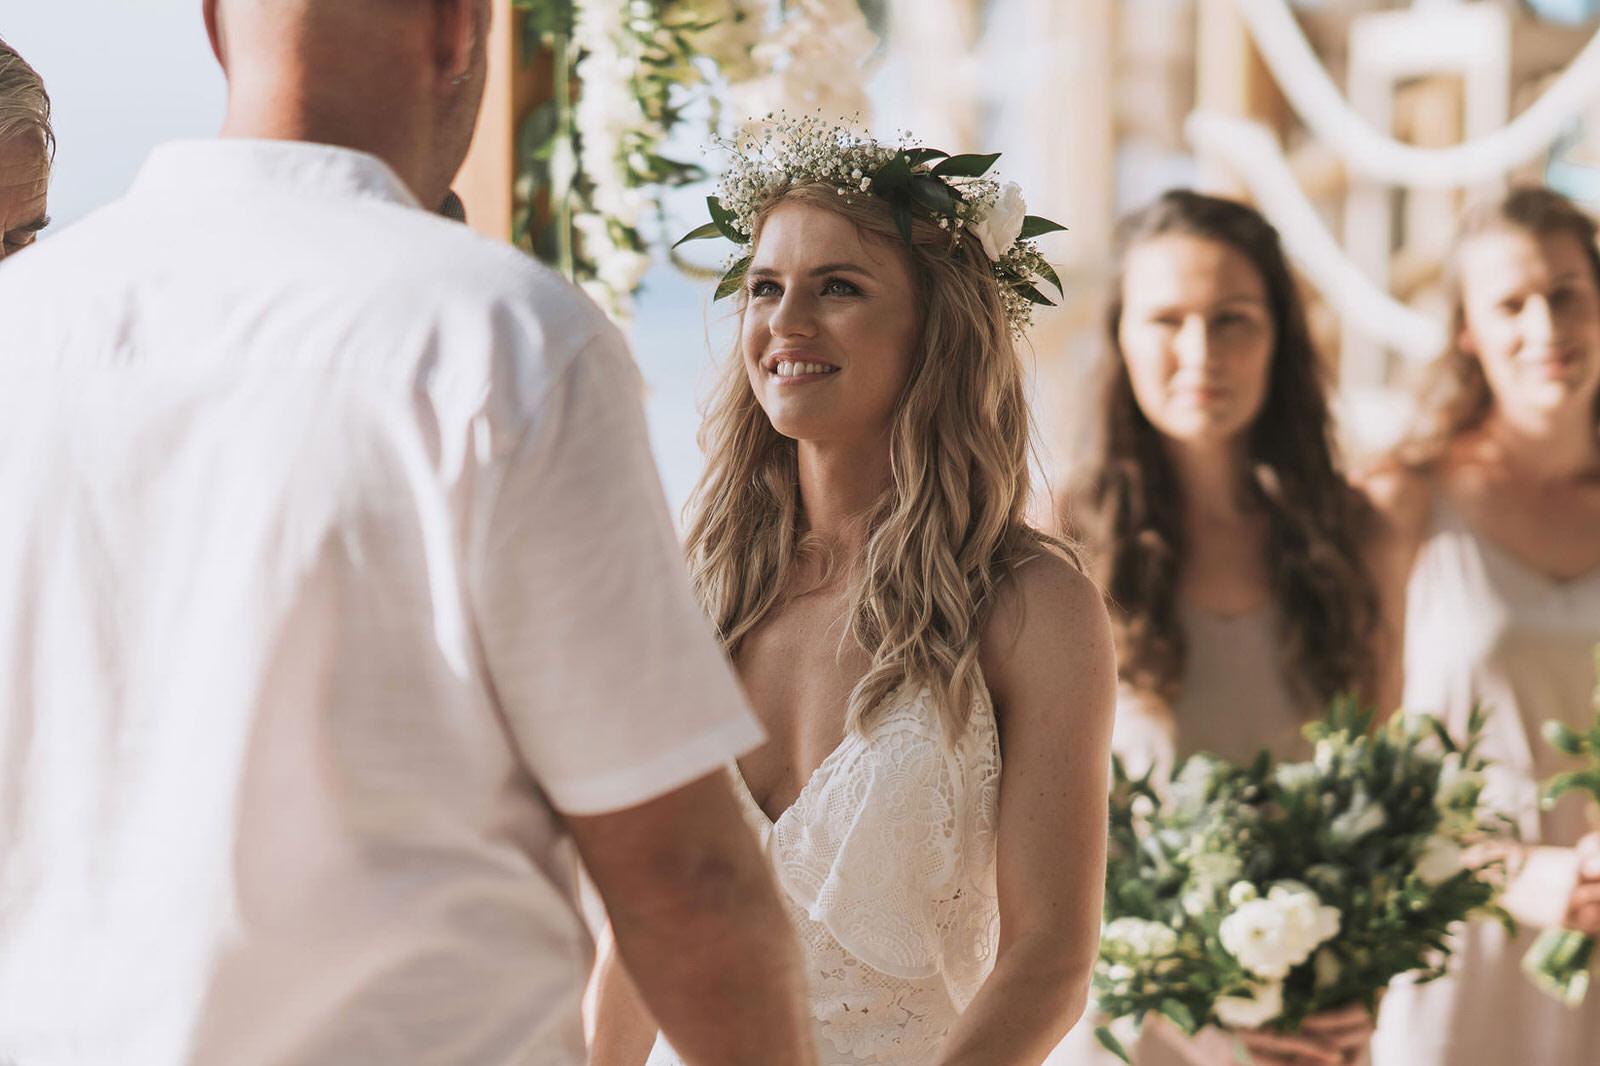 newfound-hai-tide-nusa-lembongan-bali-wedding-photographers-118